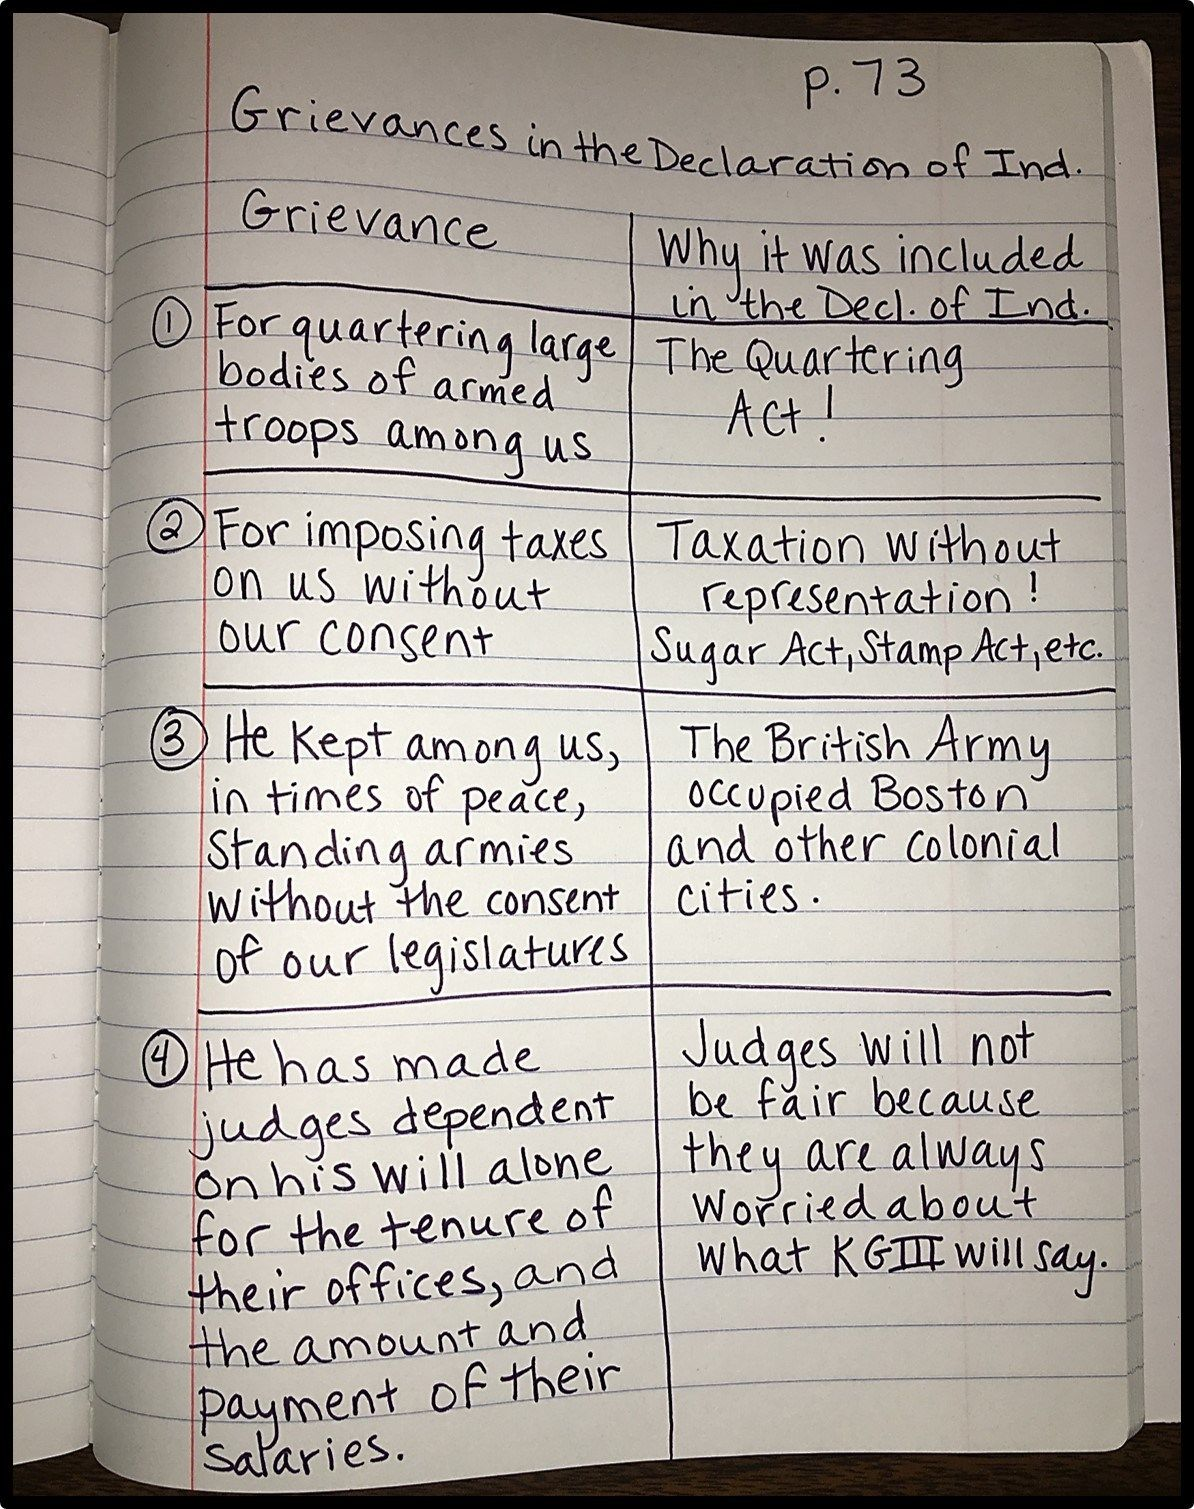 Declaration Of Independence Grievances Worksheet Answer